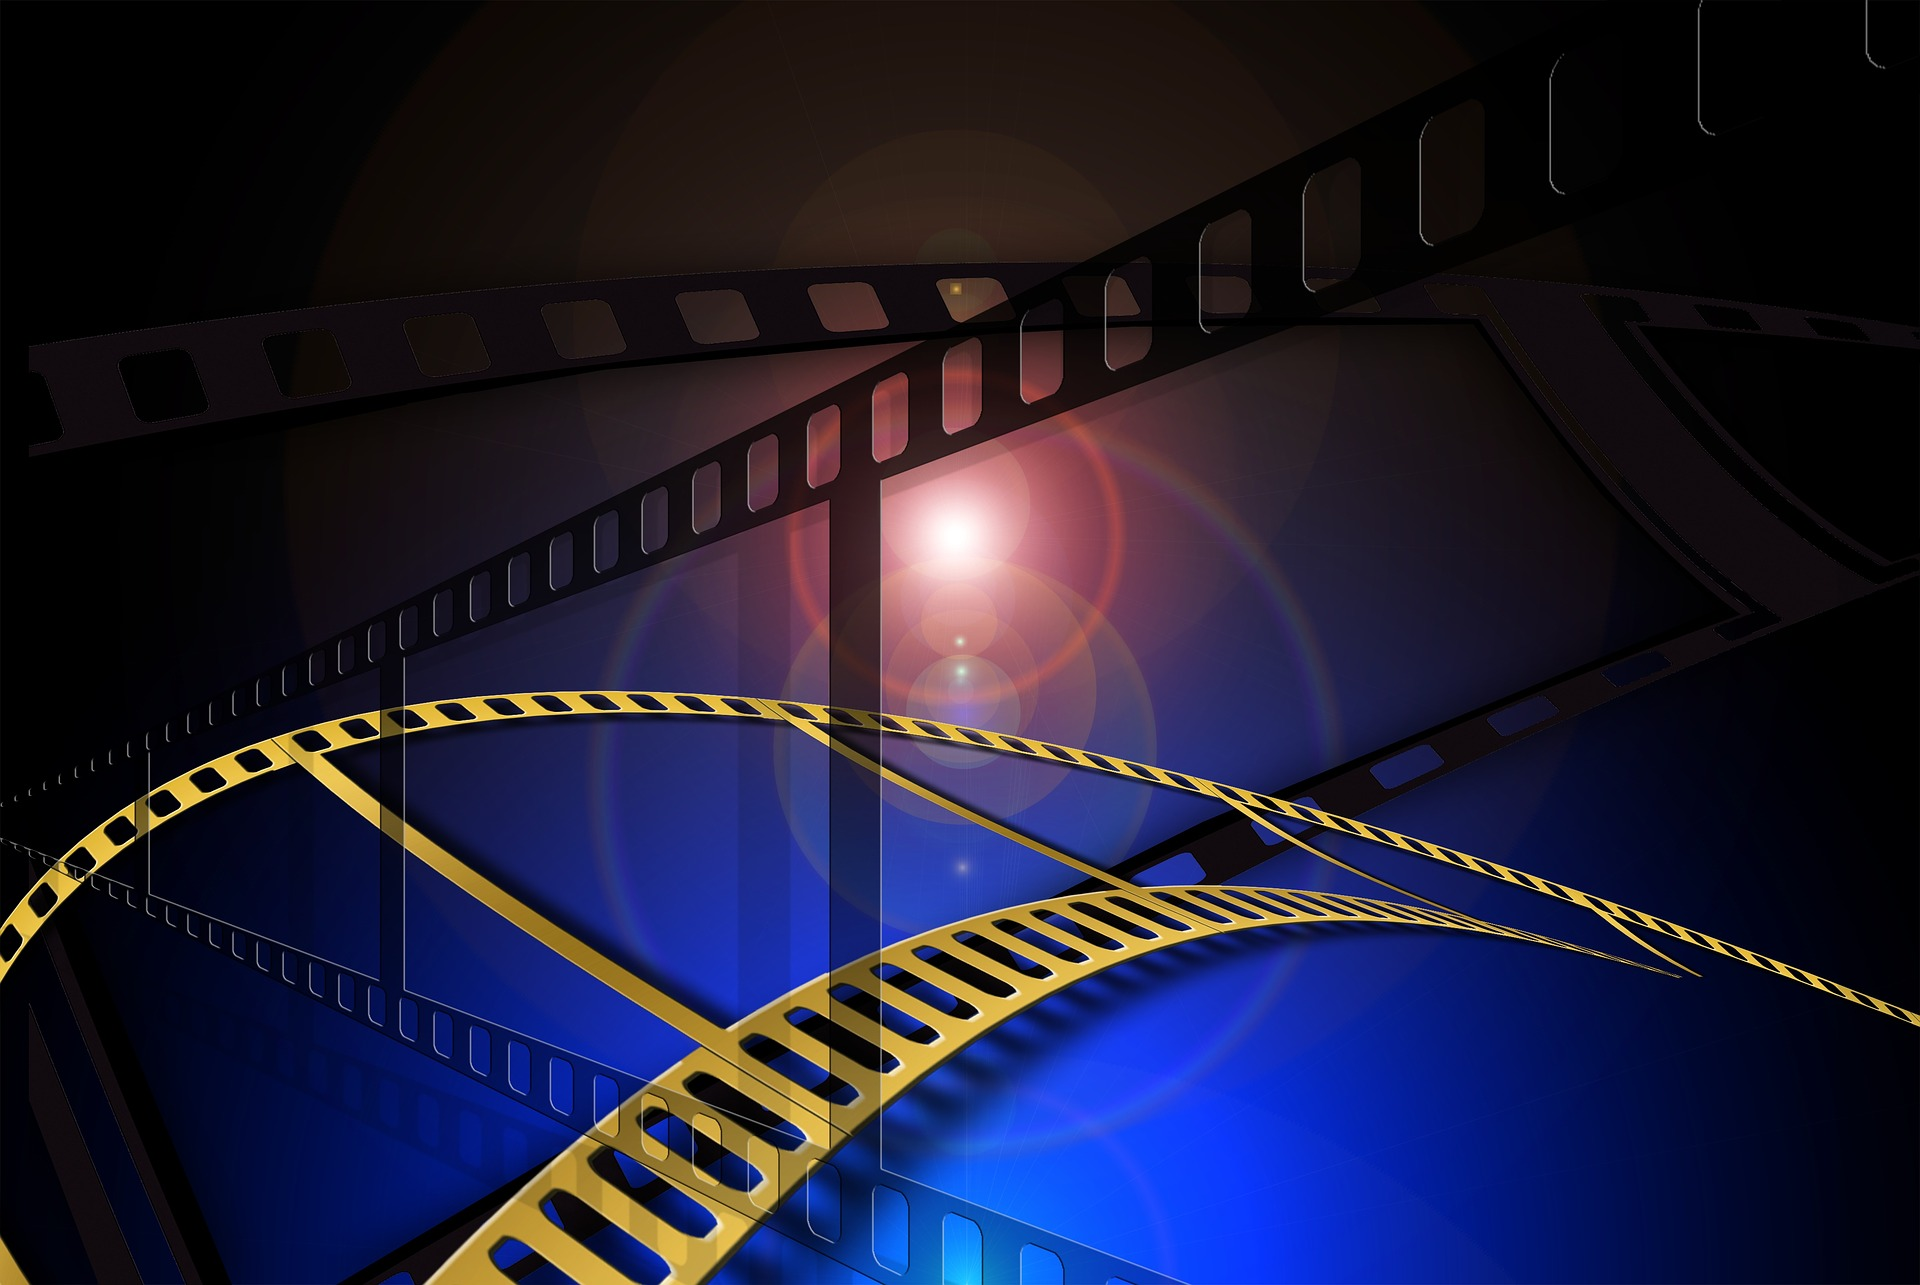 cinema-strip-2713352_1920